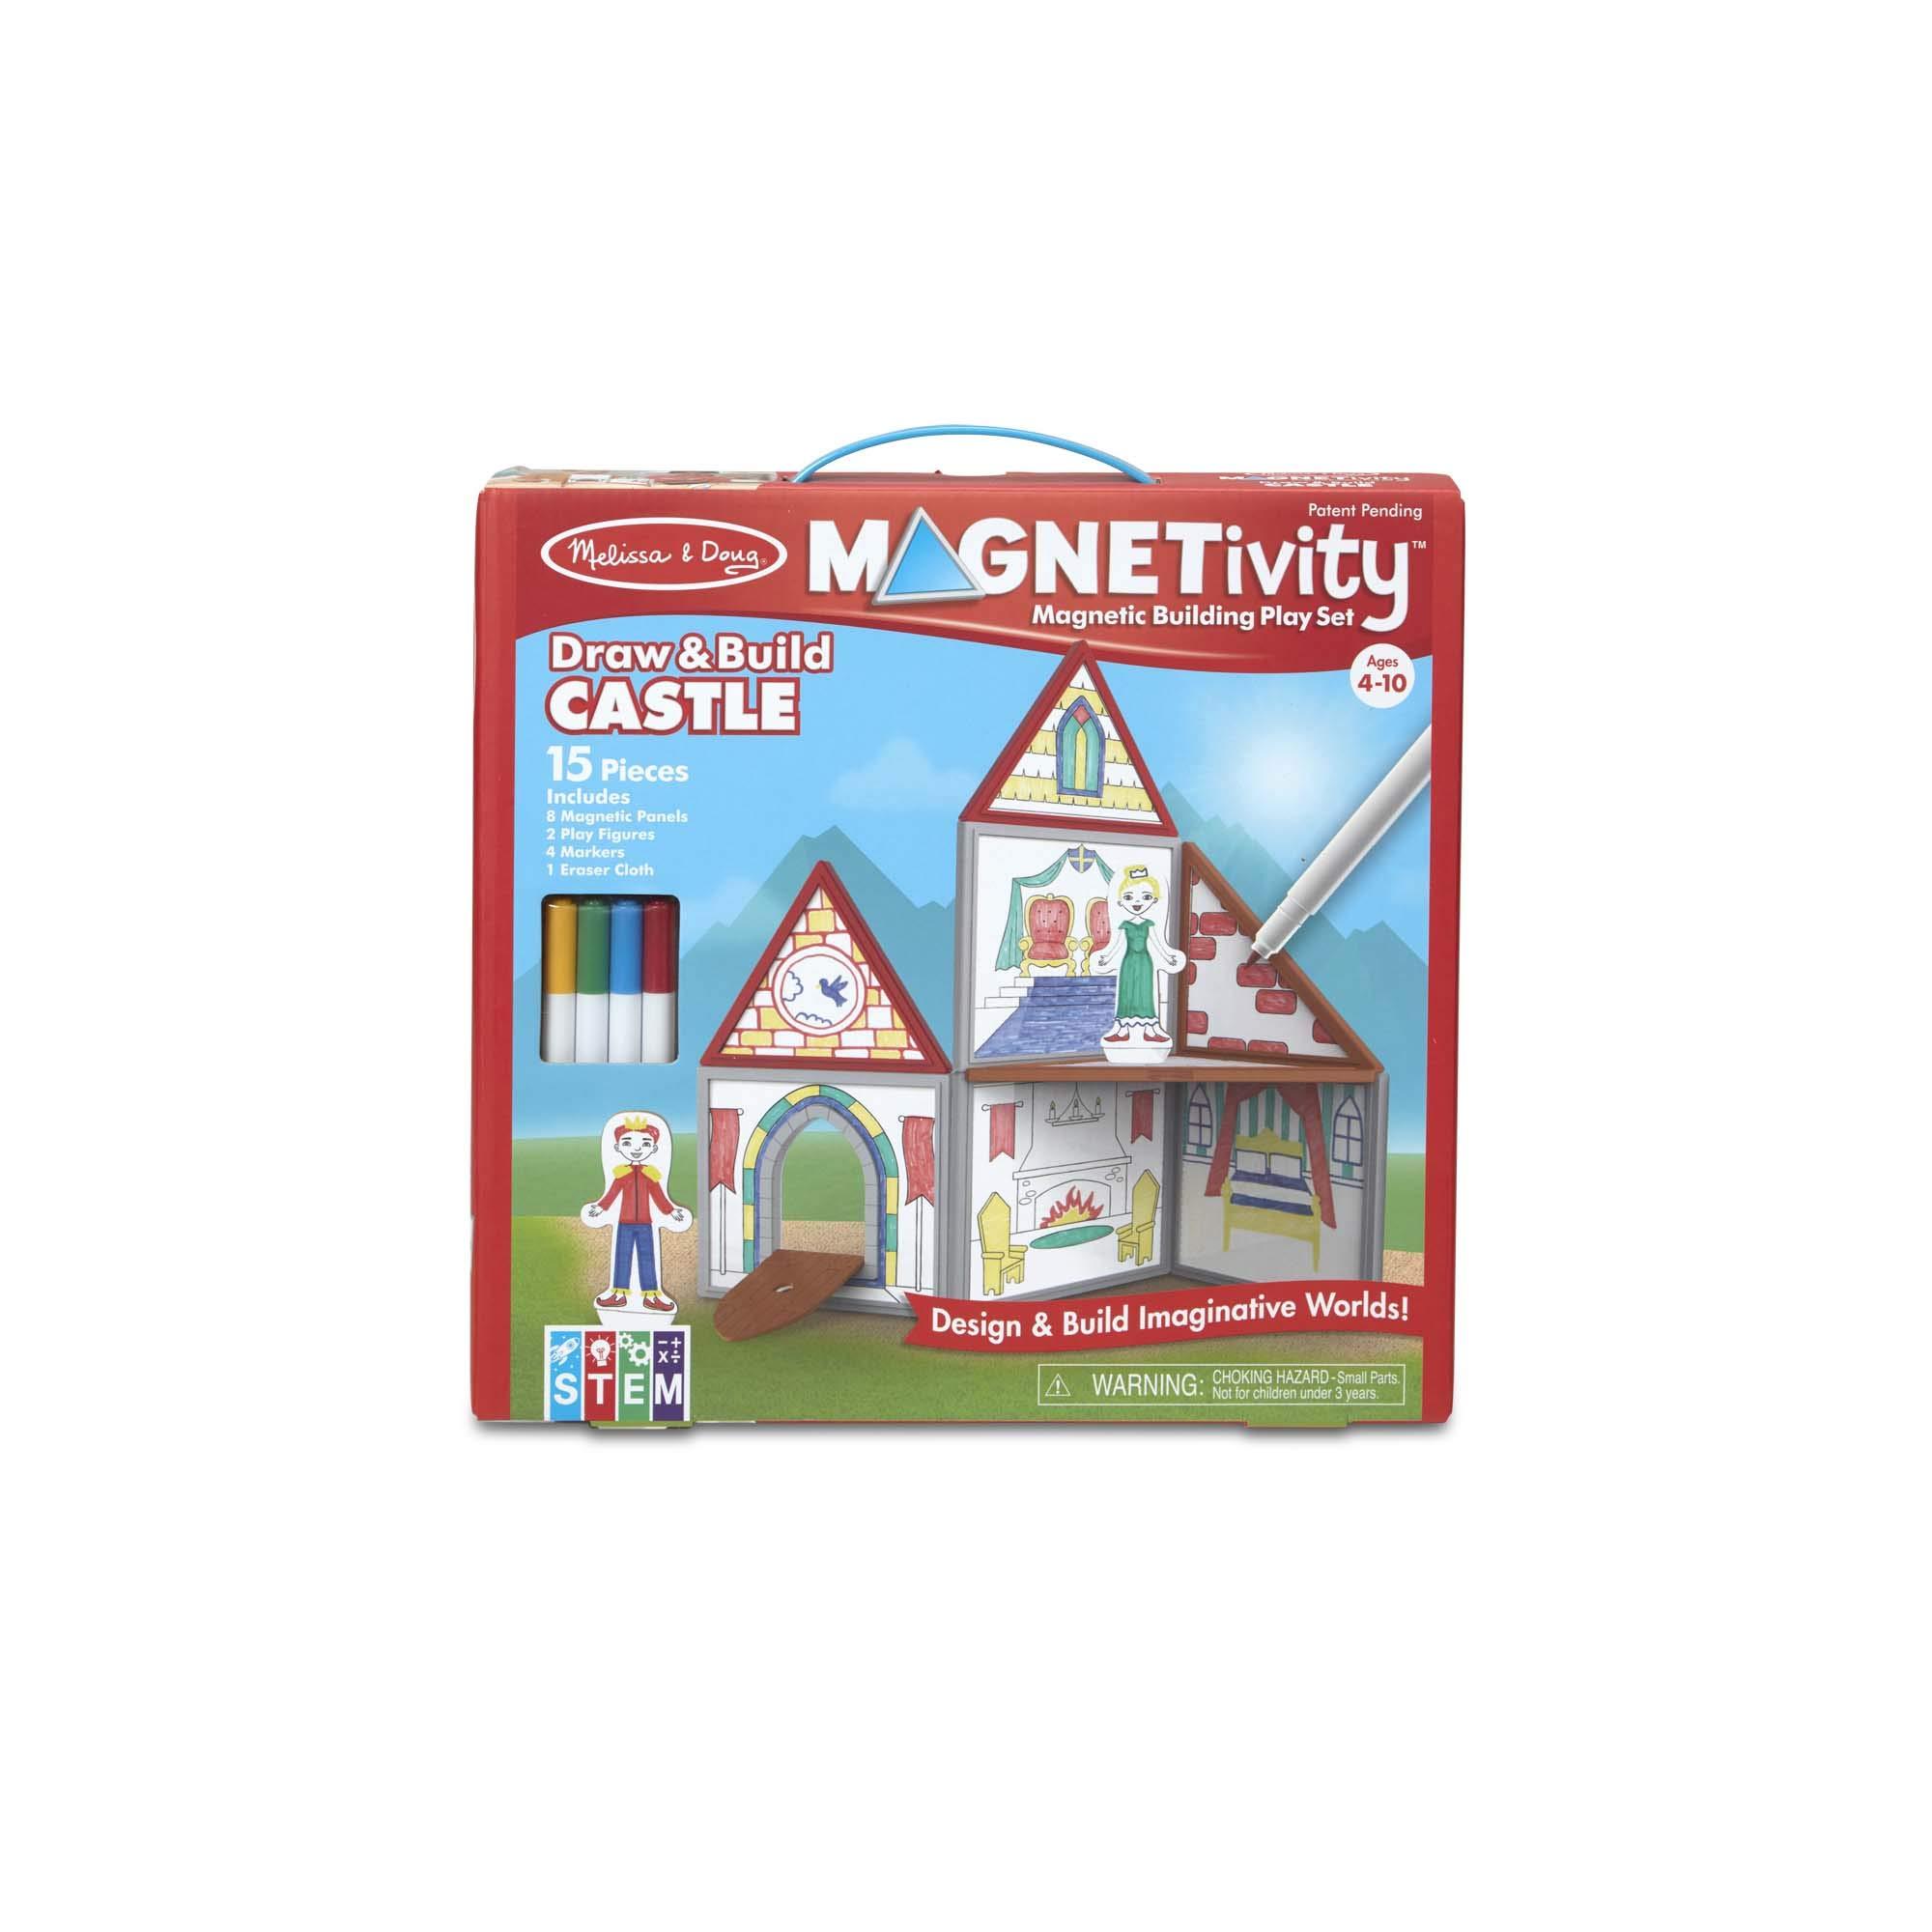 Melissa & Doug 15-Piece MAGNETIVITY Magnetic Building Play Set - Draw & Build Castle (8 Panels, 4 Dry-Erase Markers)